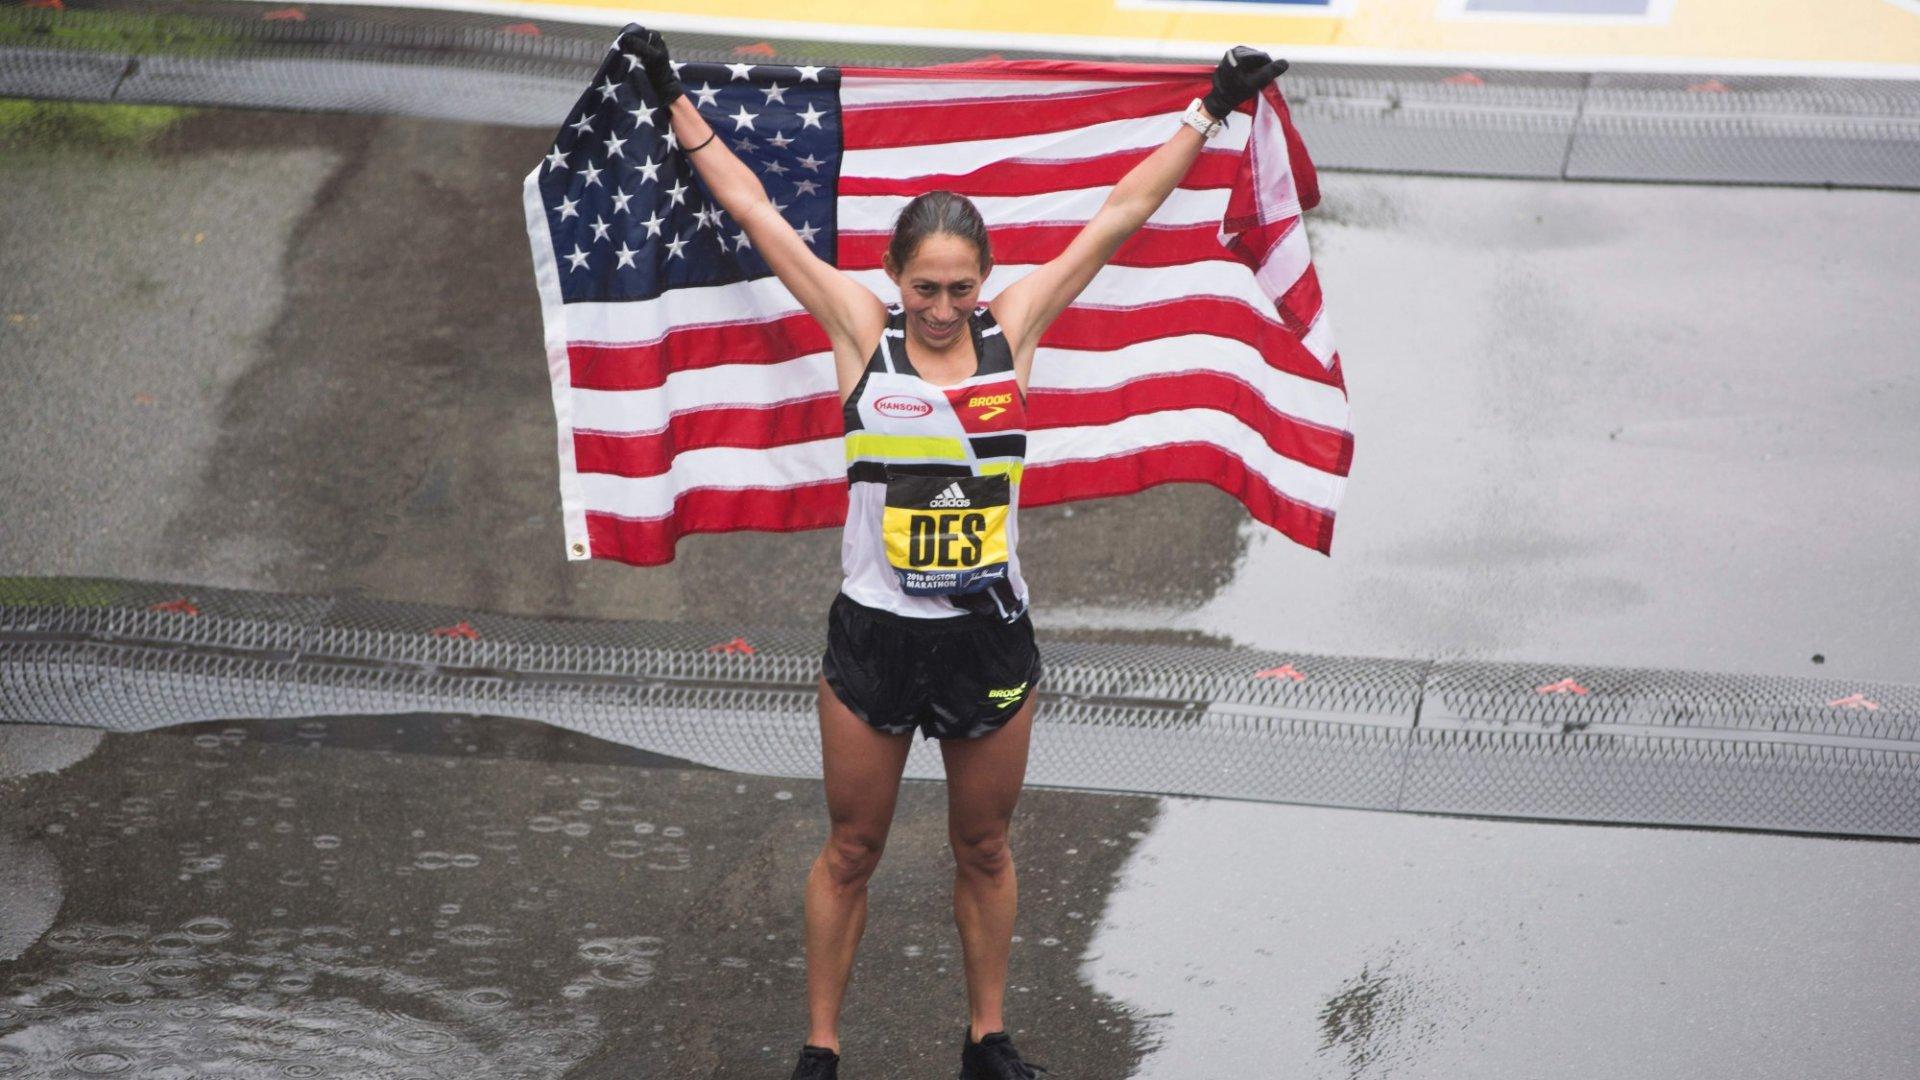 The 3 Simple Words ThatHelped Push Des Linden to Win the Boston Marathon